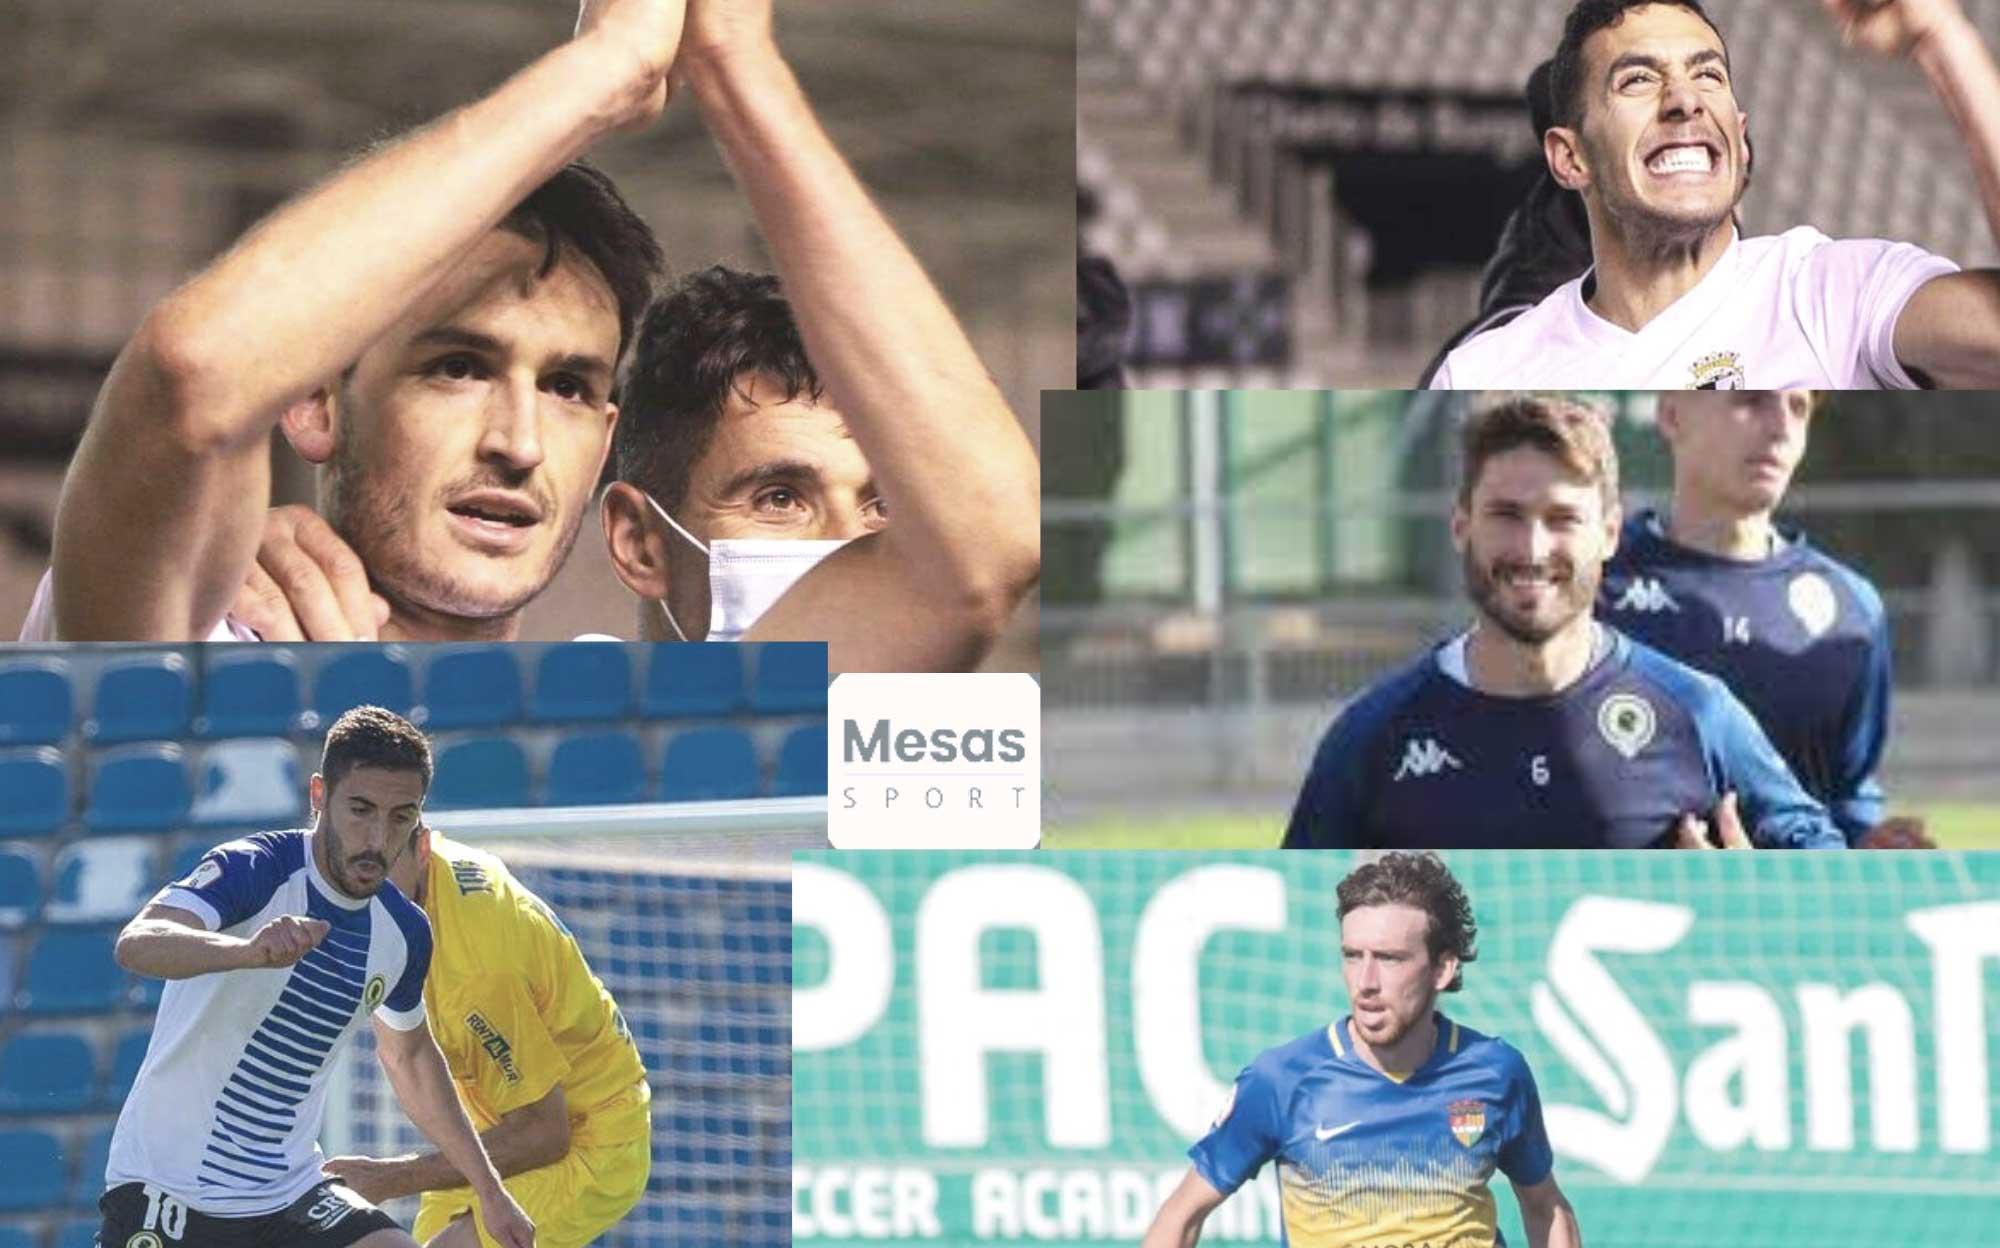 Imagen de futbolistas Mesas Sport